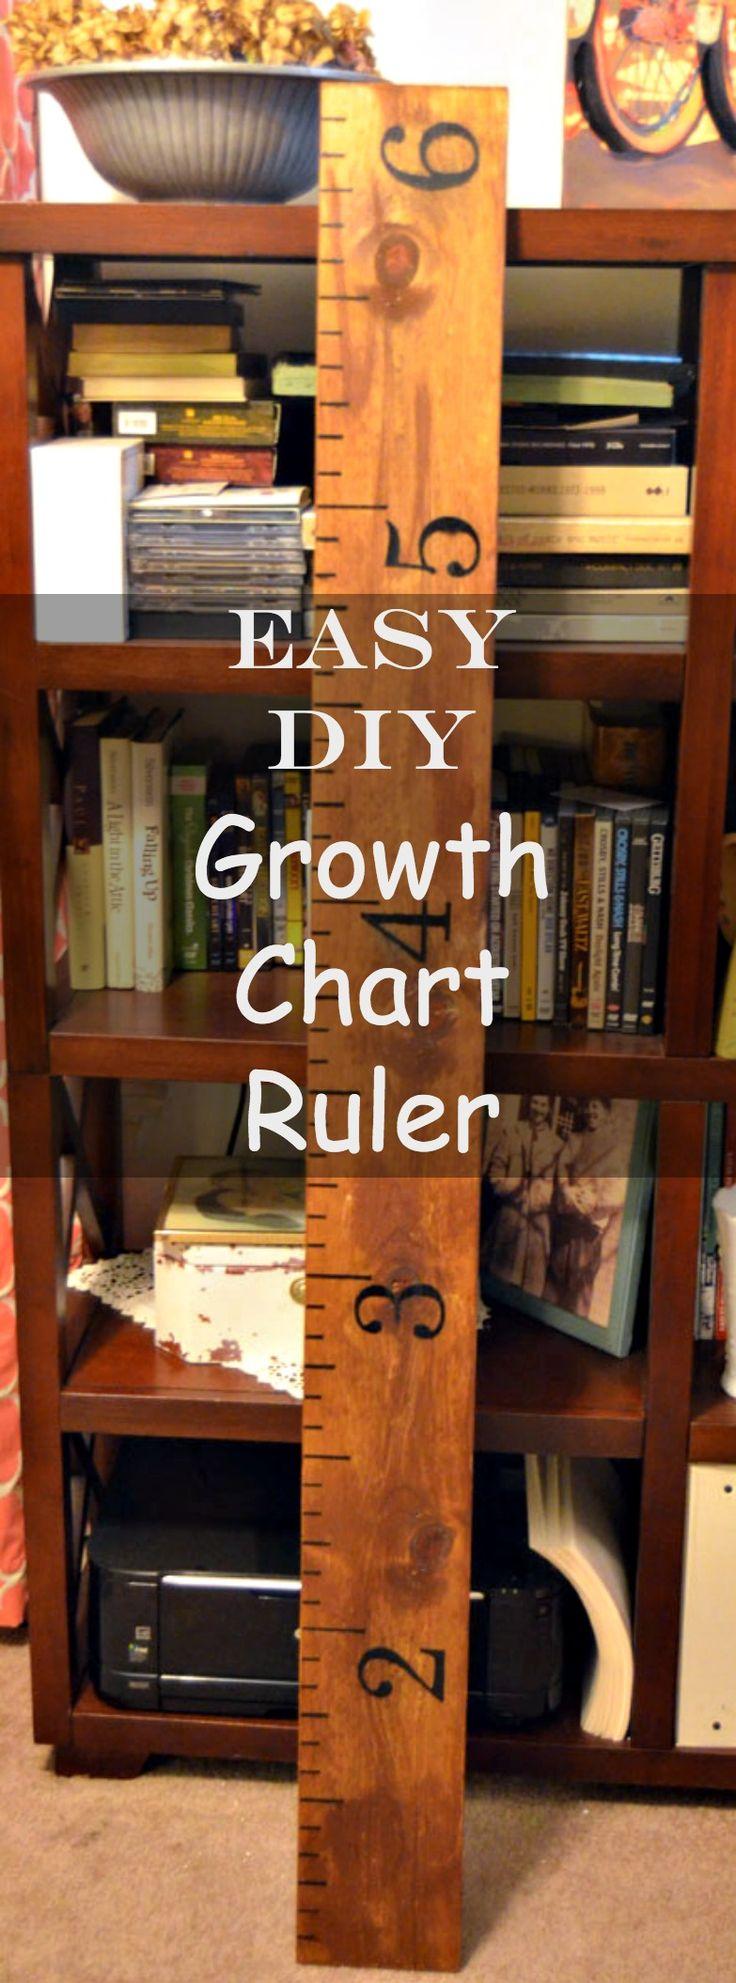 How to Make a Growth Chart Ruler | createandbabble.com